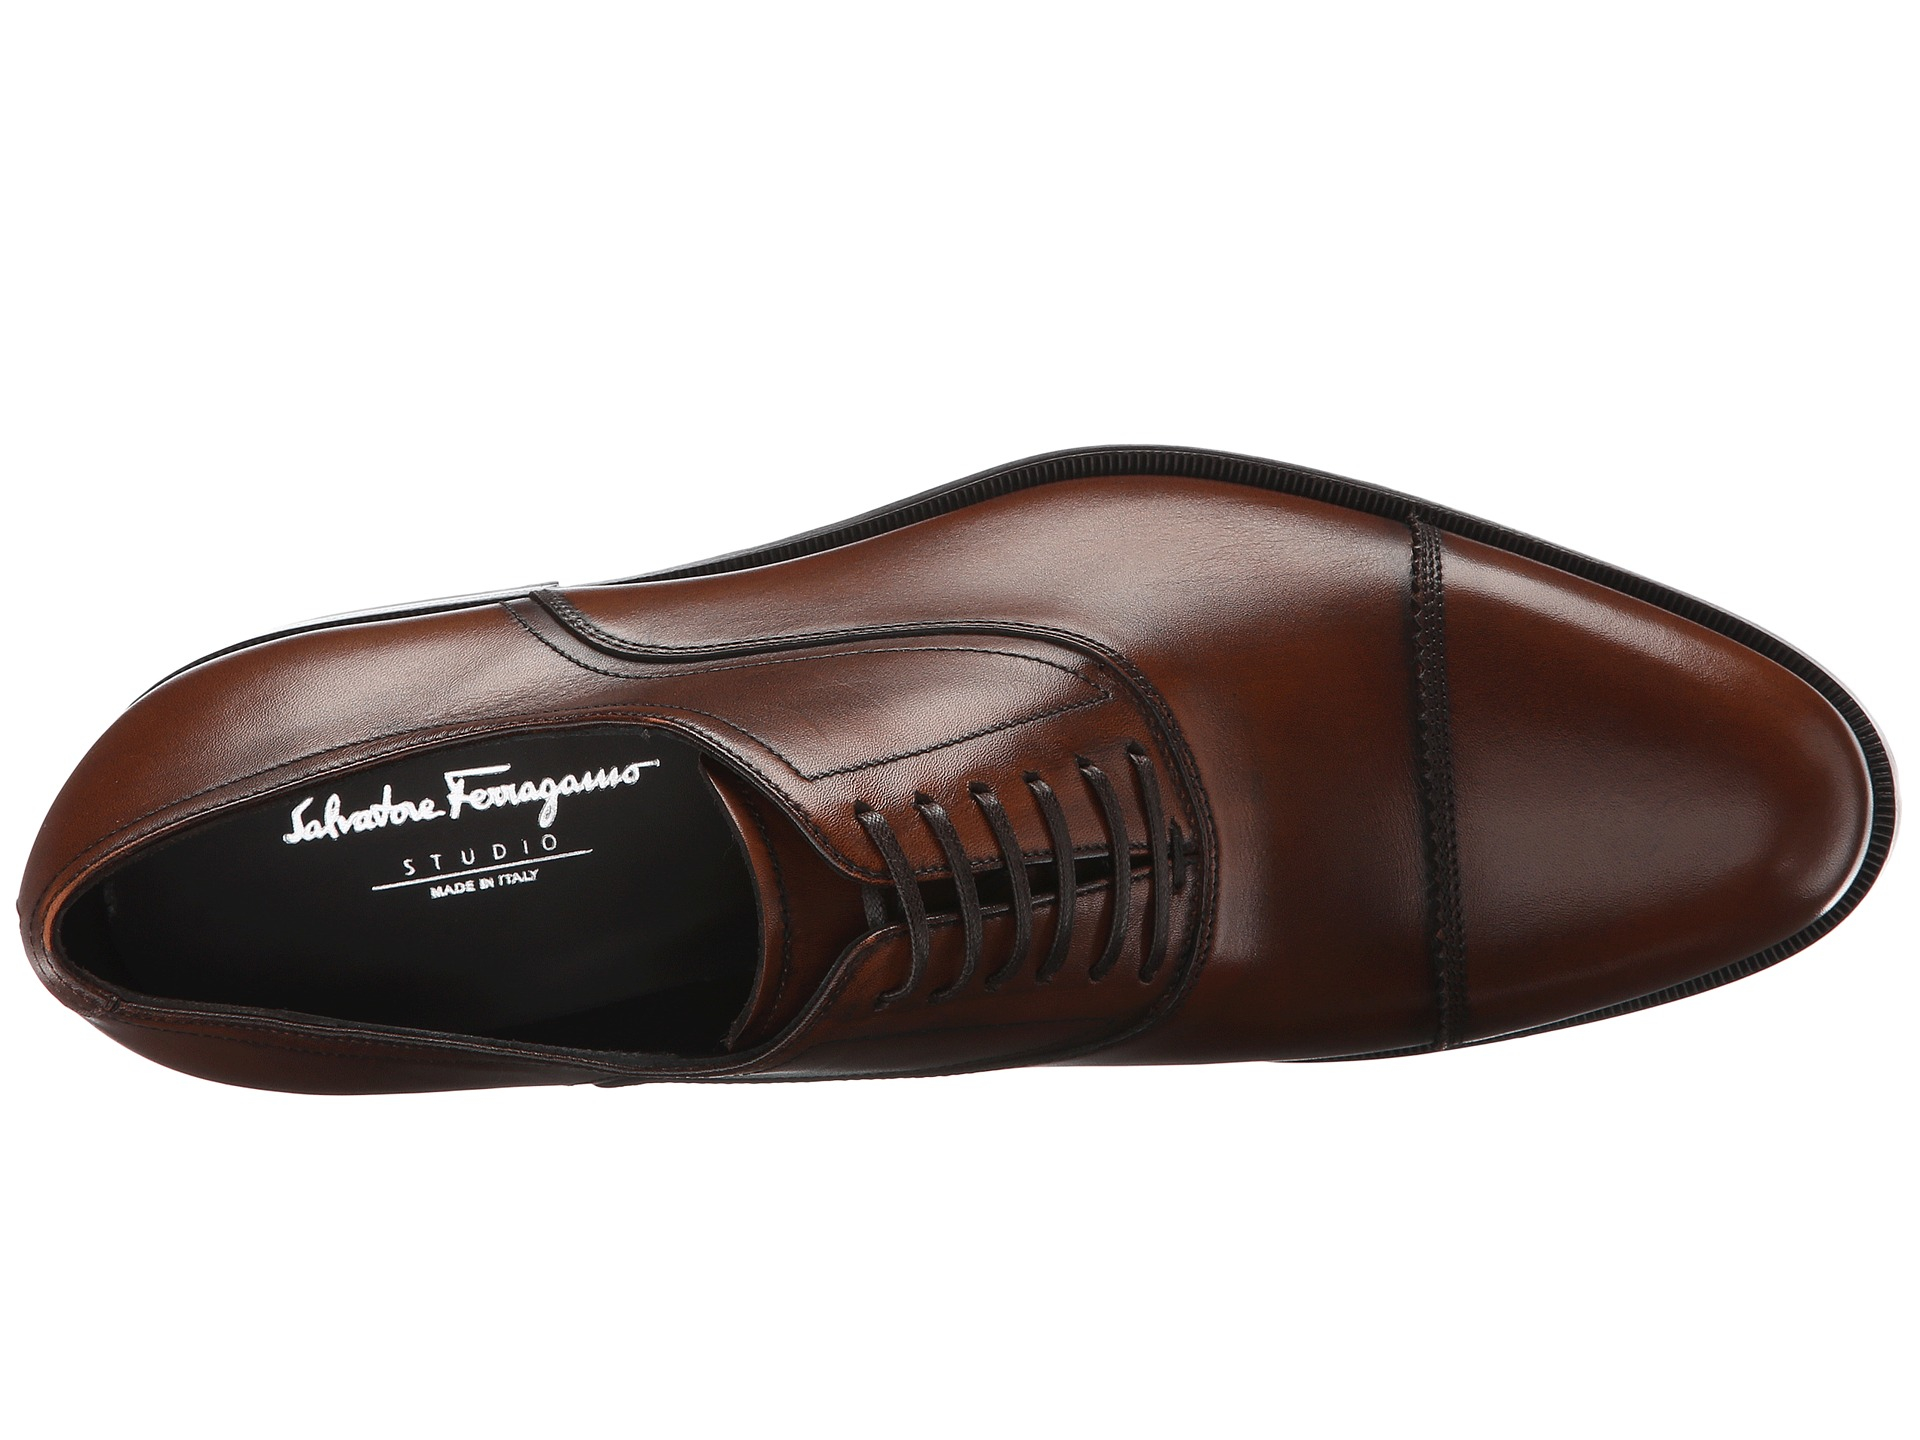 Ferragamo Leather Guru Oxford in Brown